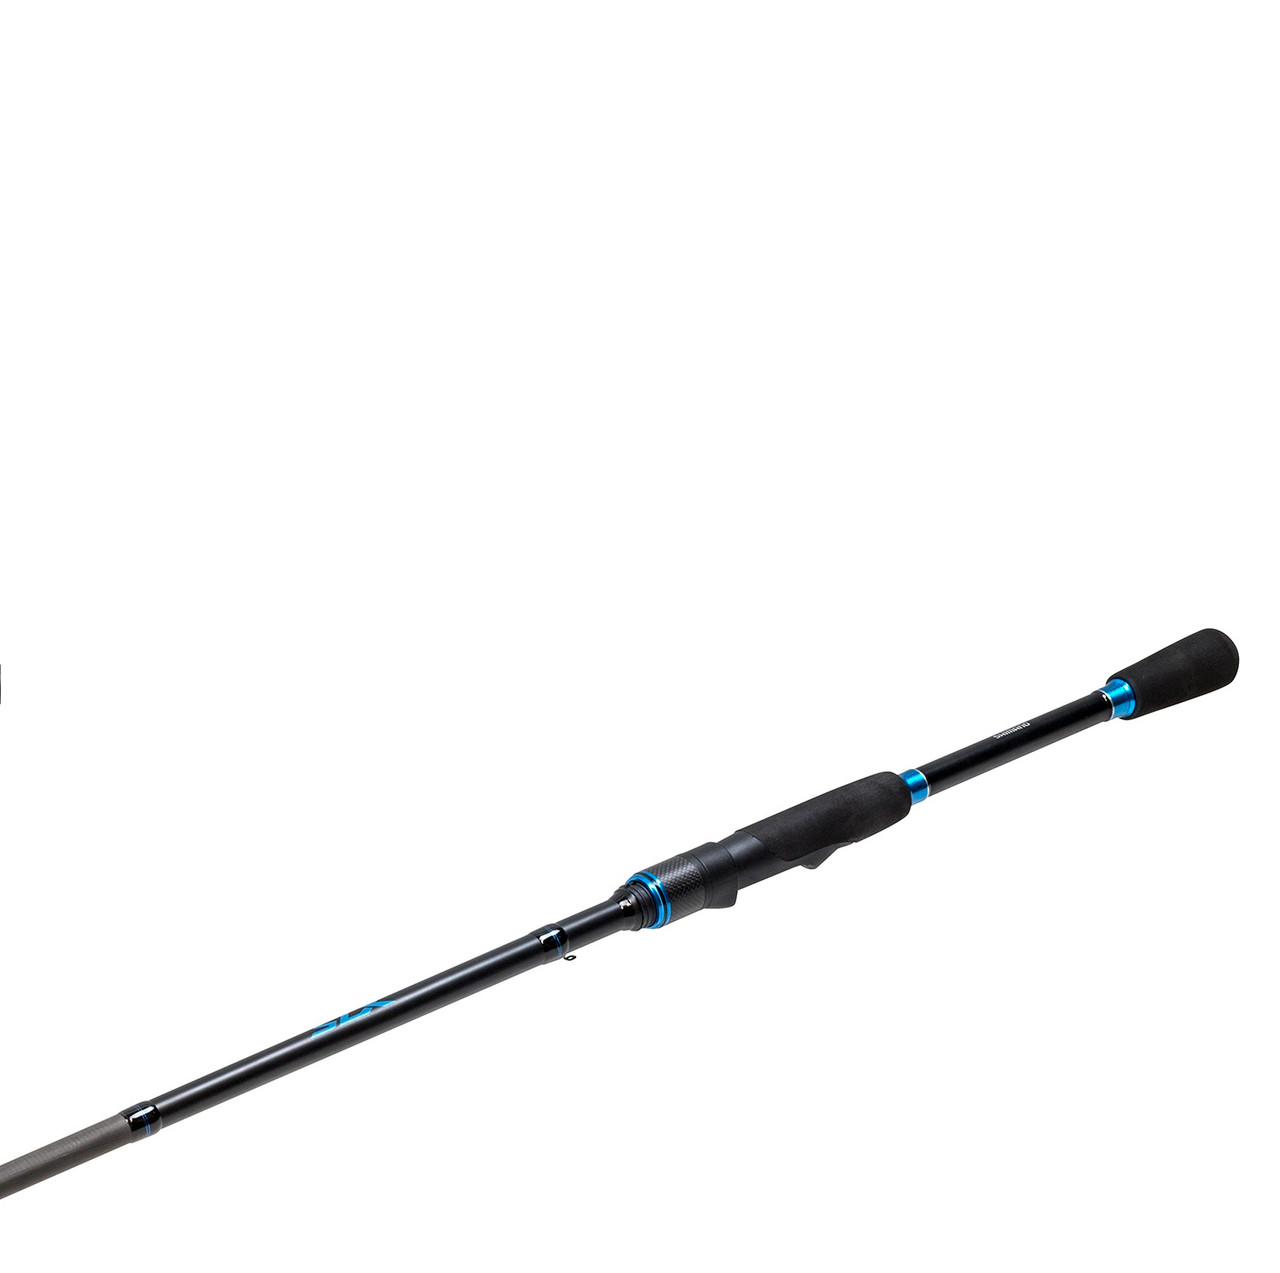 SLXSX70 1-Piece Rods